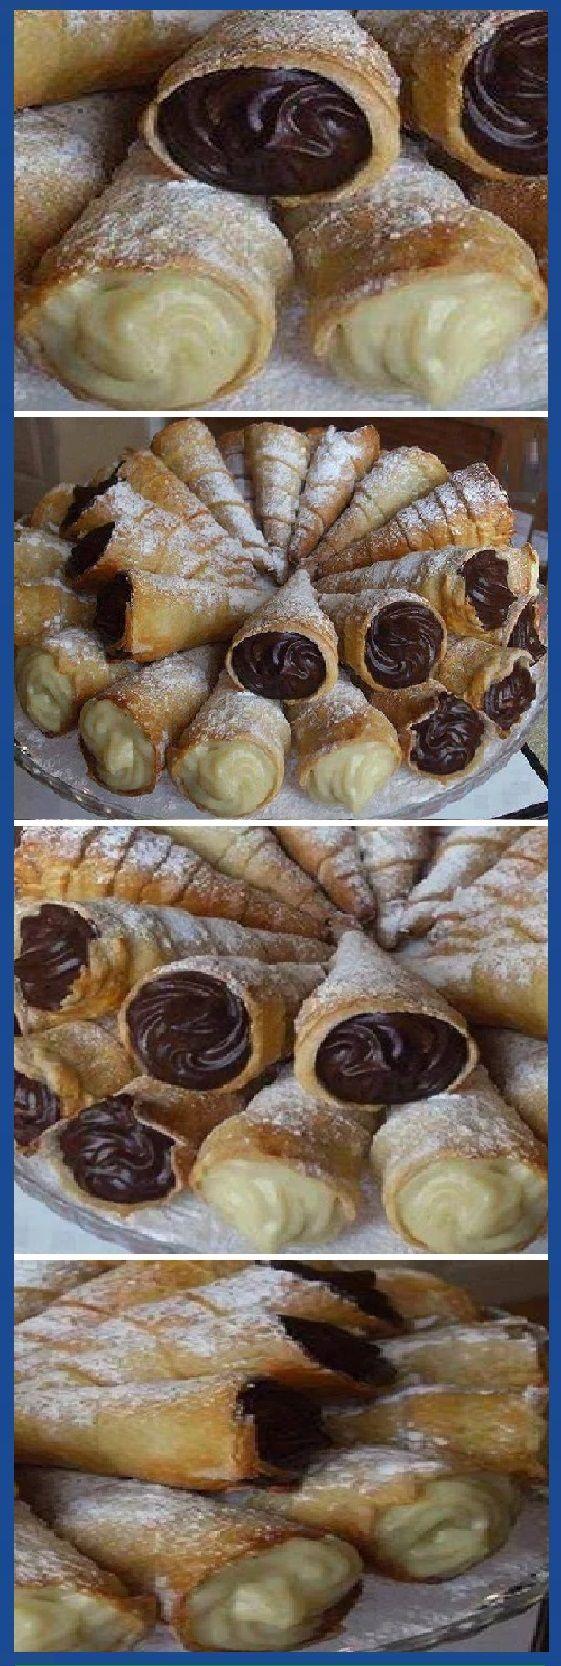 Los Mejores CONOS DULCES del Mundo Rellenos de CHOCOLATE Y VAINILLA! #conos #dulces #conoschocolate #conosvainilla #vainilla #cheesecake #postres #dulces #tips #cake #pan #panfrances #panettone #panes #pantone #pan #recetas #recipe #casero #torta #tartas #pastel #nestlecocina #bizcocho #bizcochuelo #tasty #cocina #chocolate Si te gusta dinos HOLA y dale a Me Gusta MIREN …